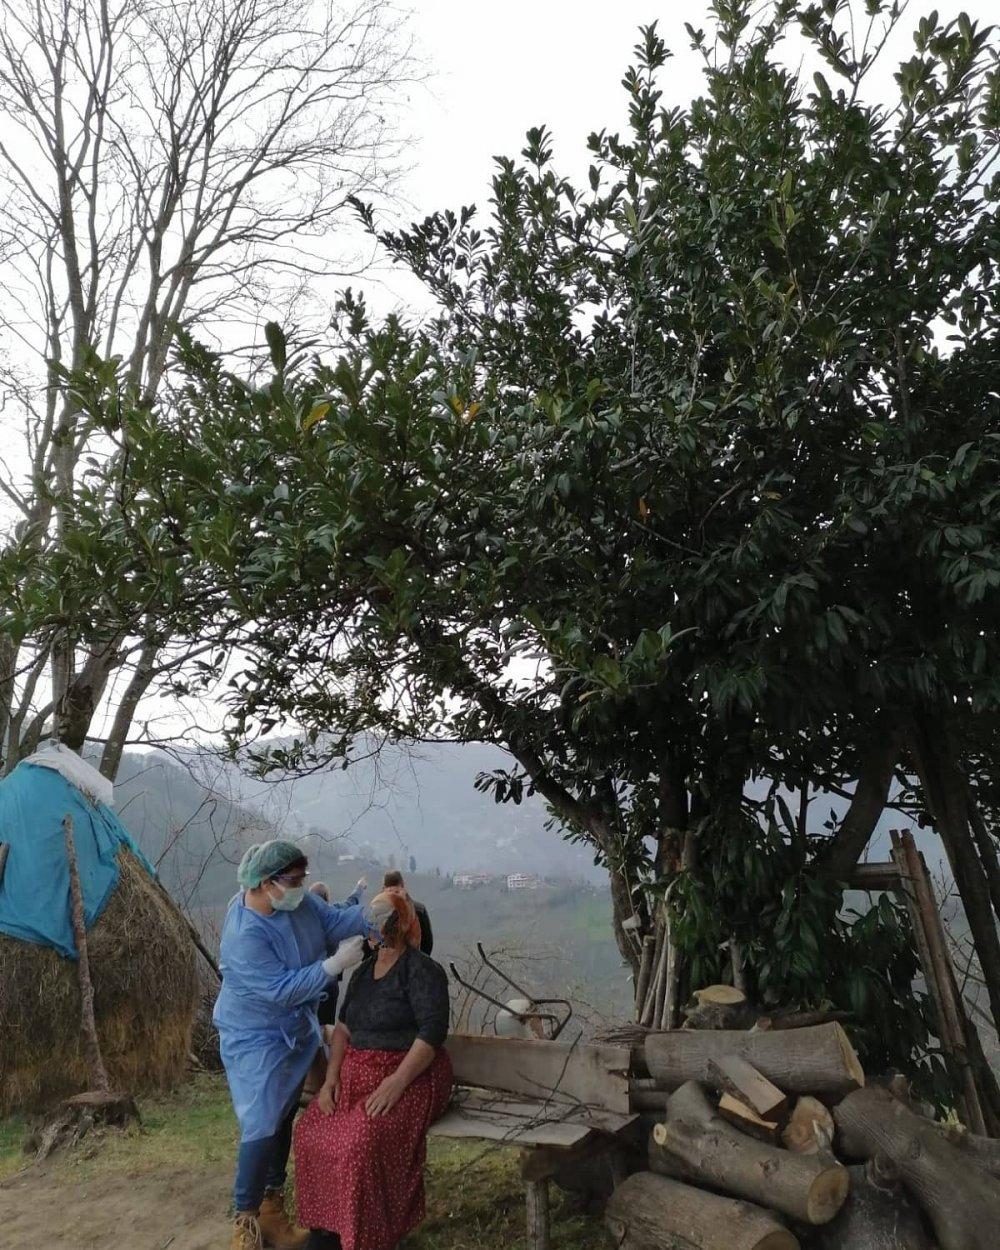 Trabzon'da koronavirüs tarama çalışması tamamlandı